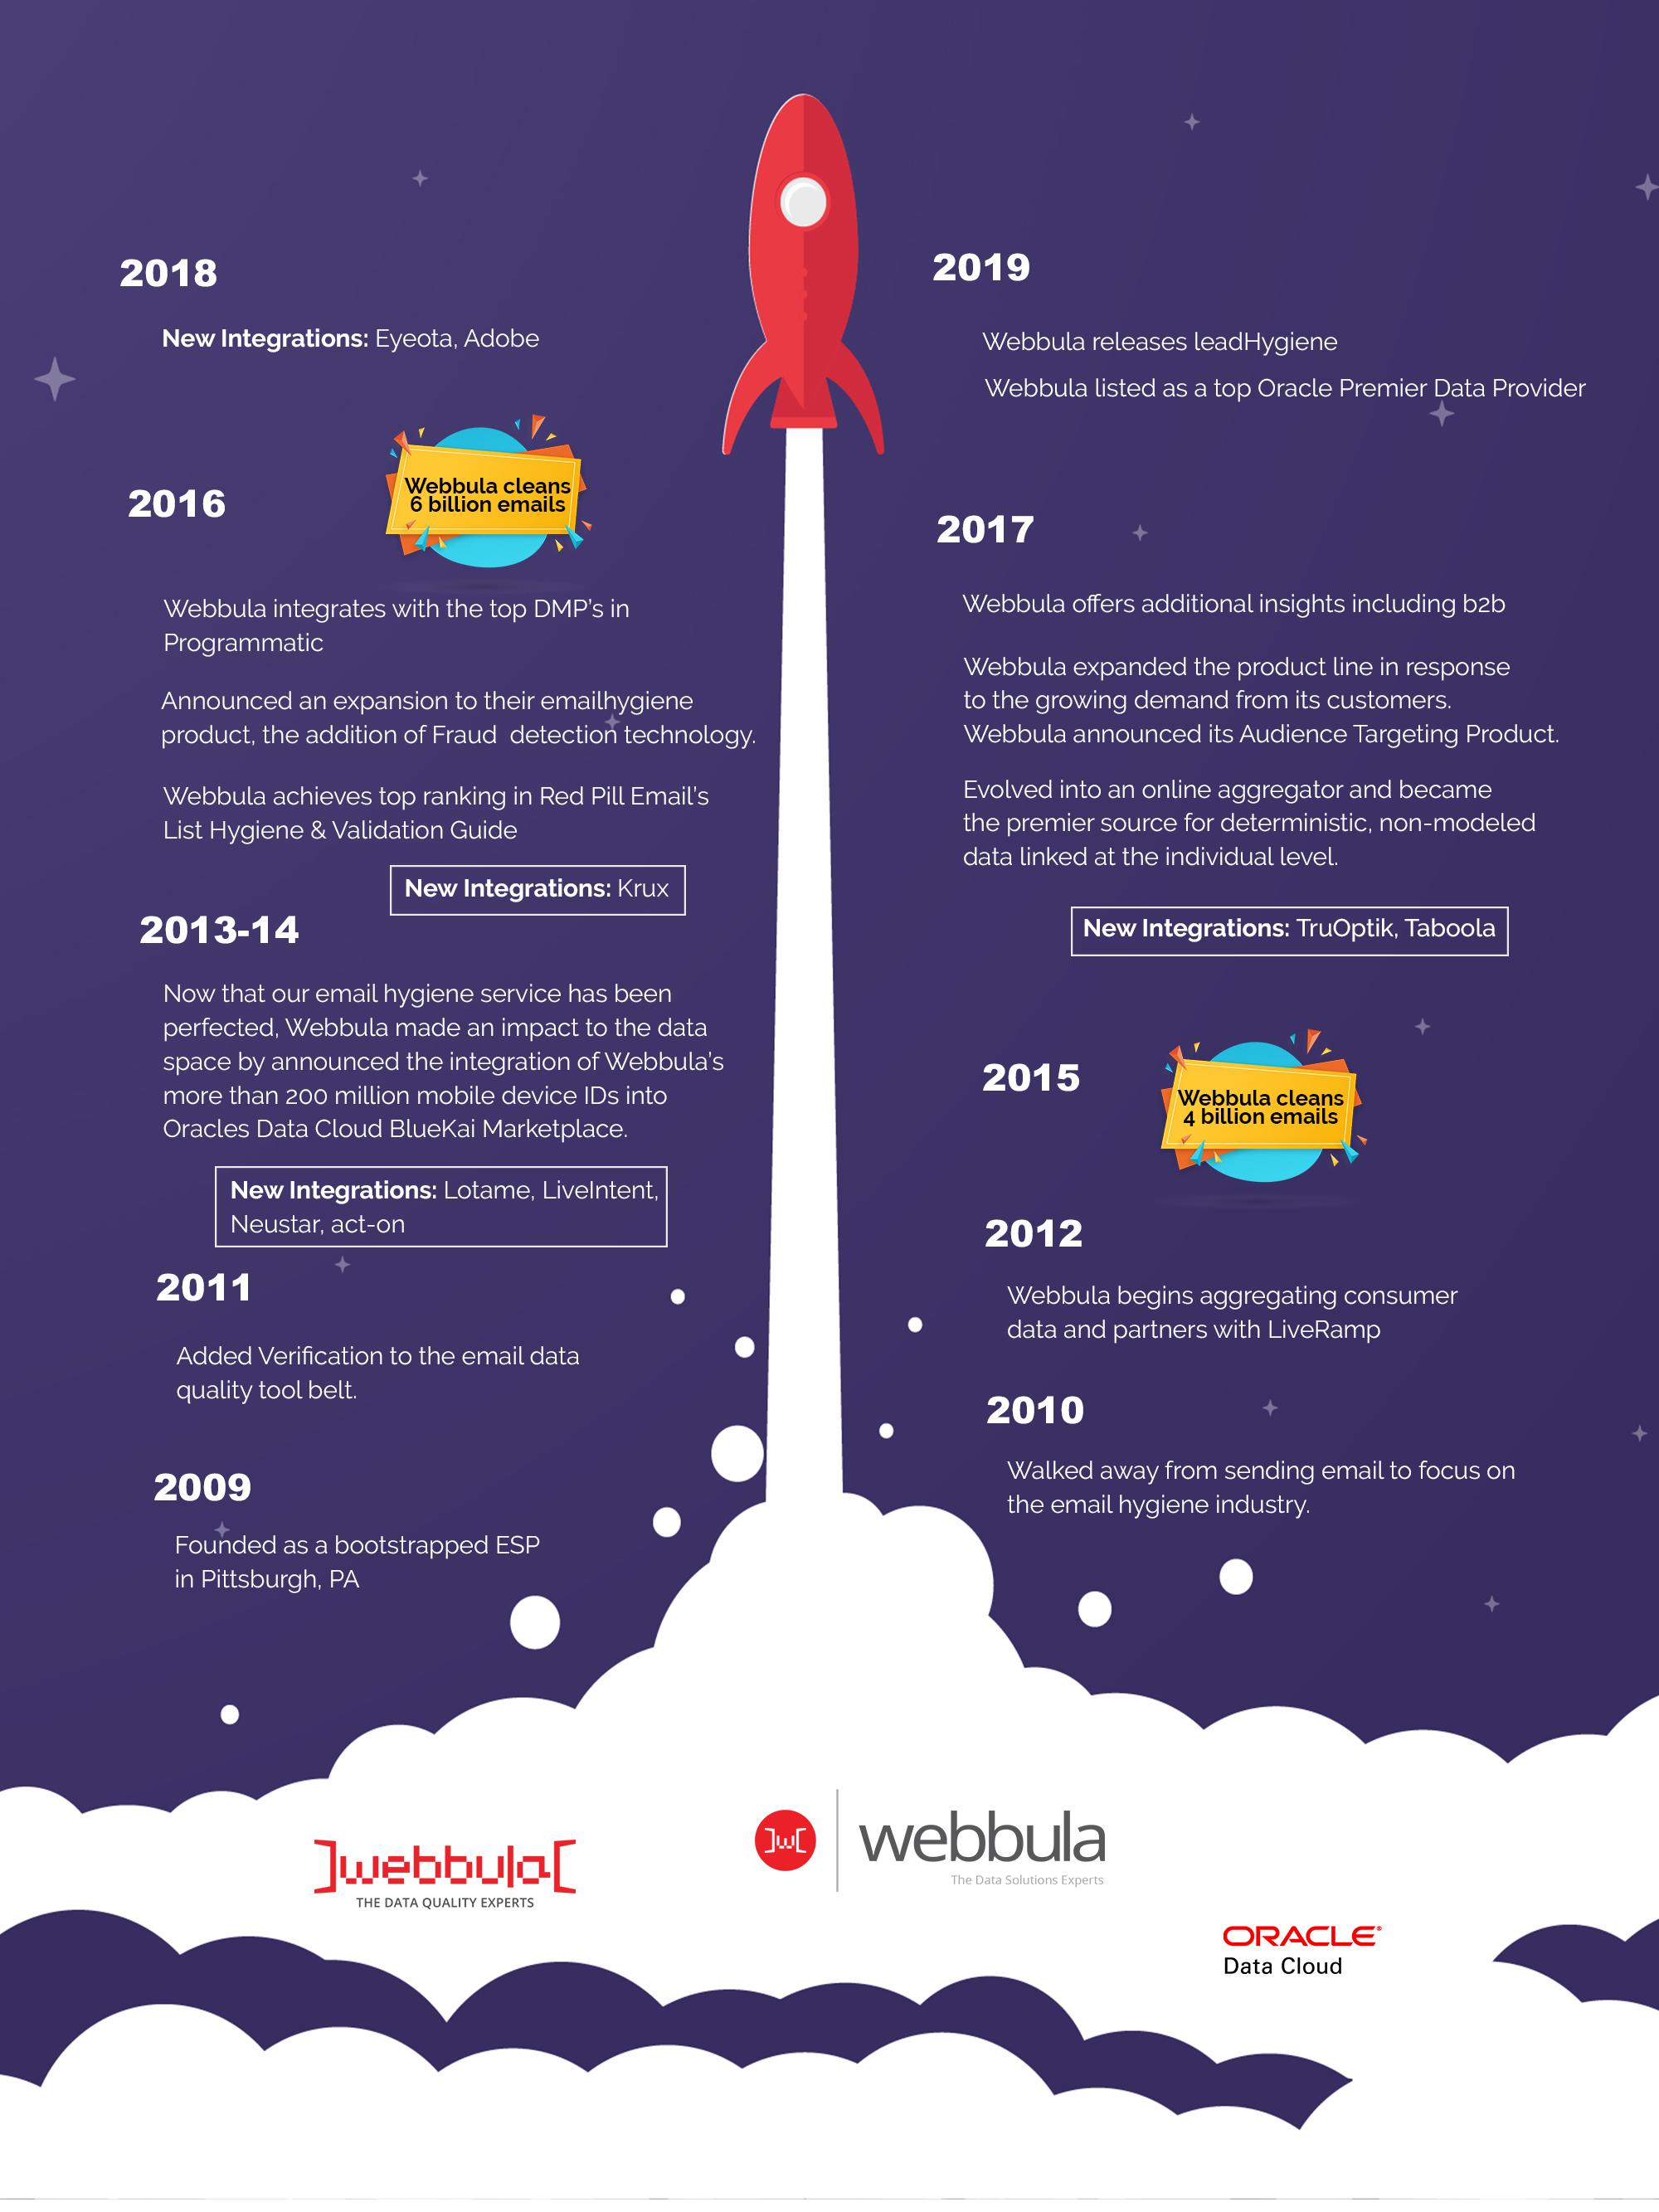 Webbula 10 year anniversay